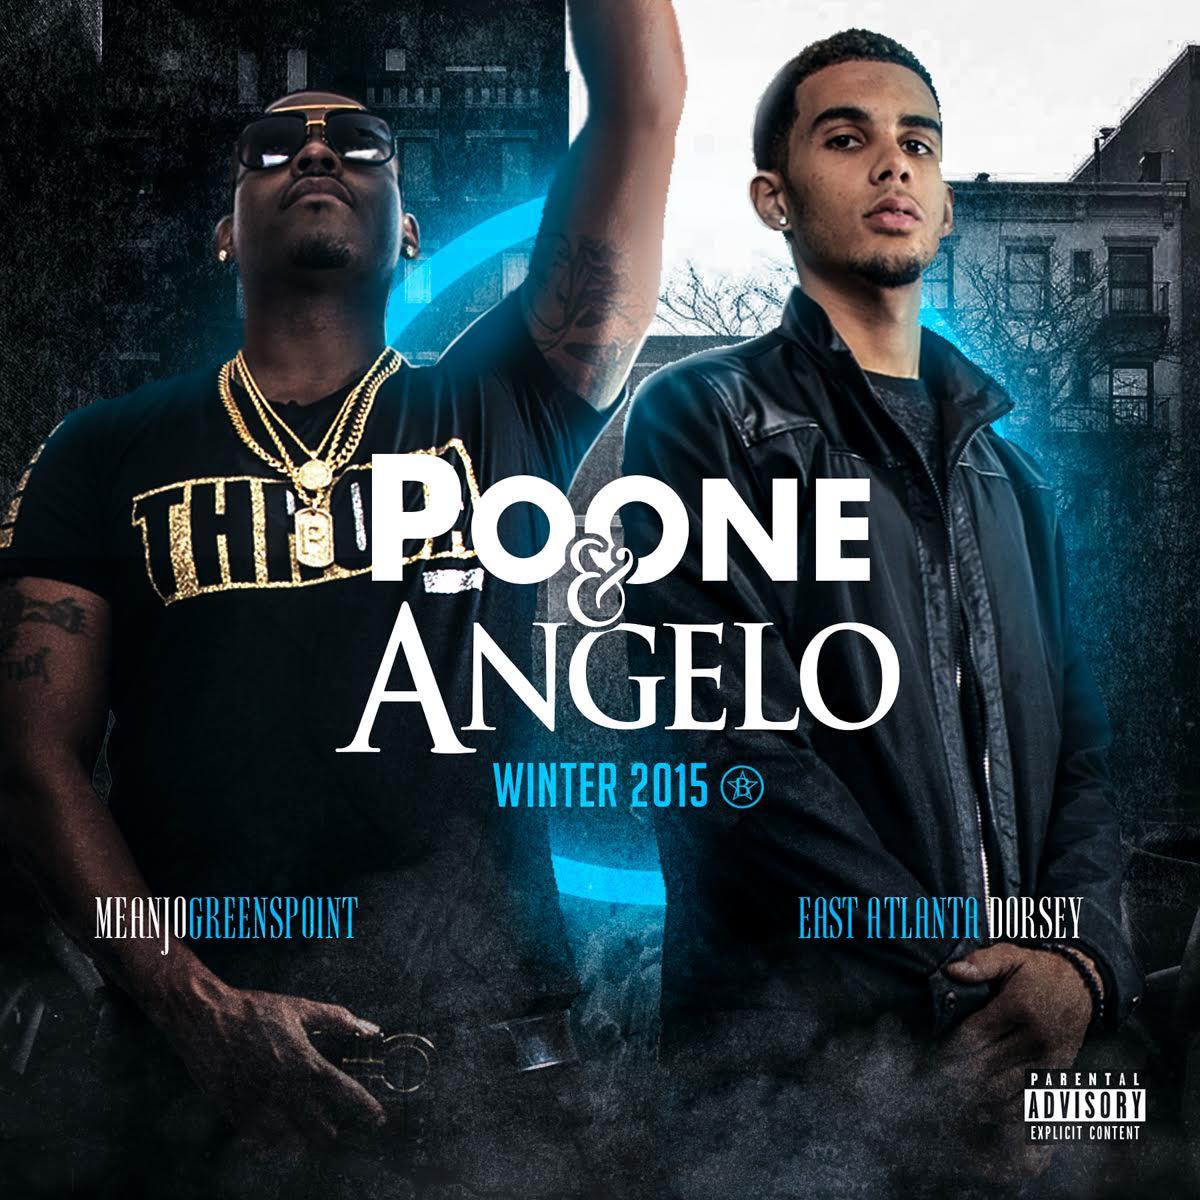 Poone Angelo